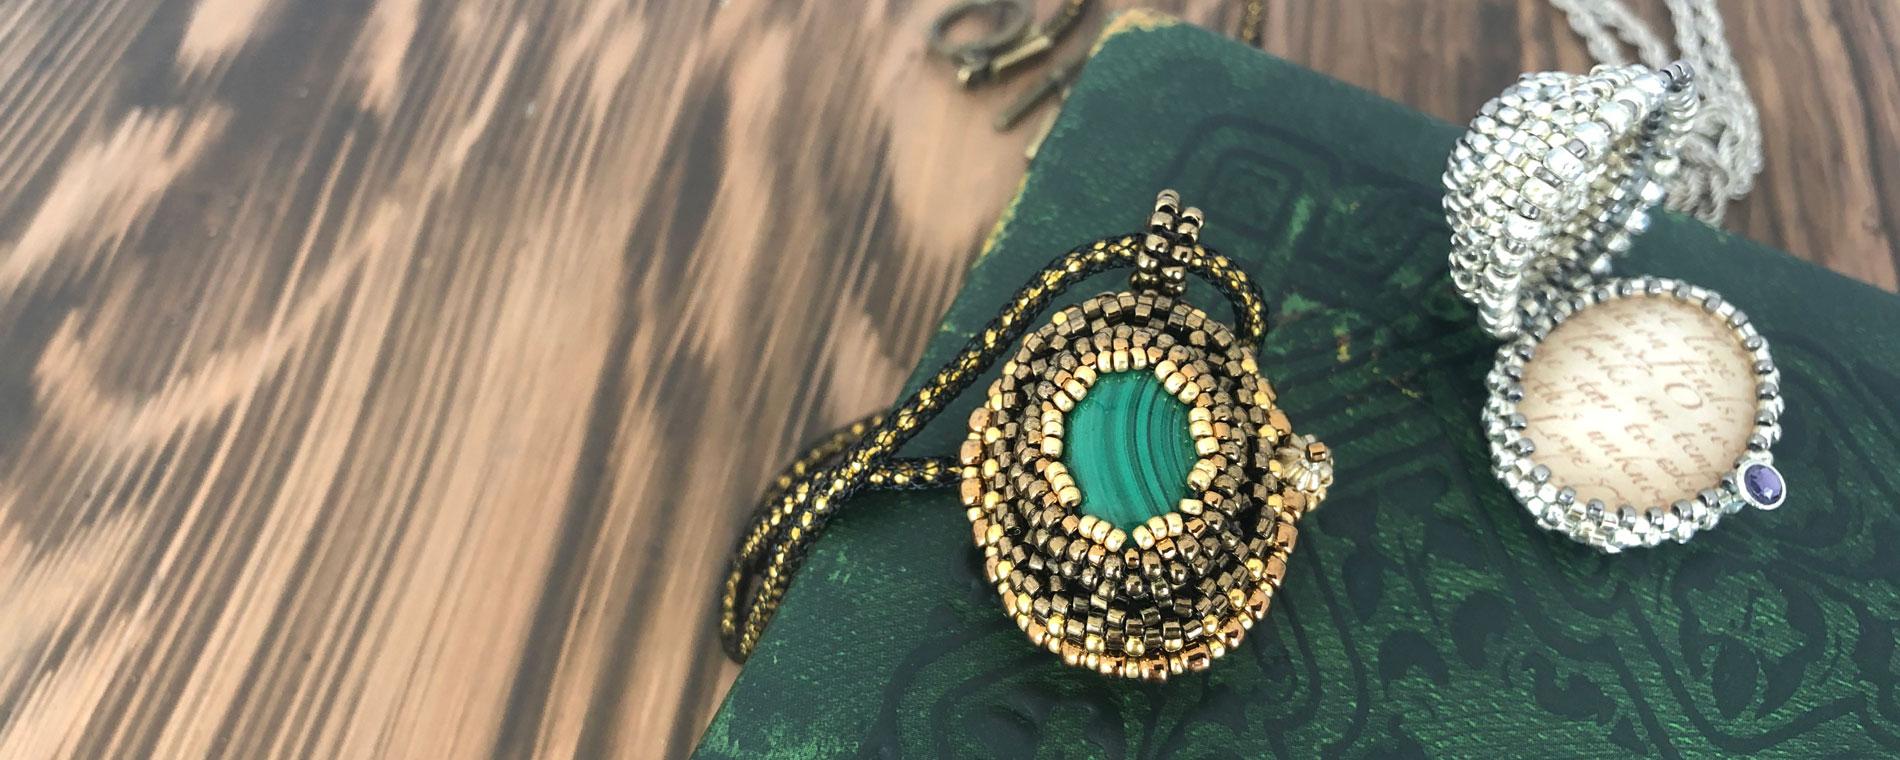 Jane Seymour's Locket - Tudor inspired beading project by Chloe Menage